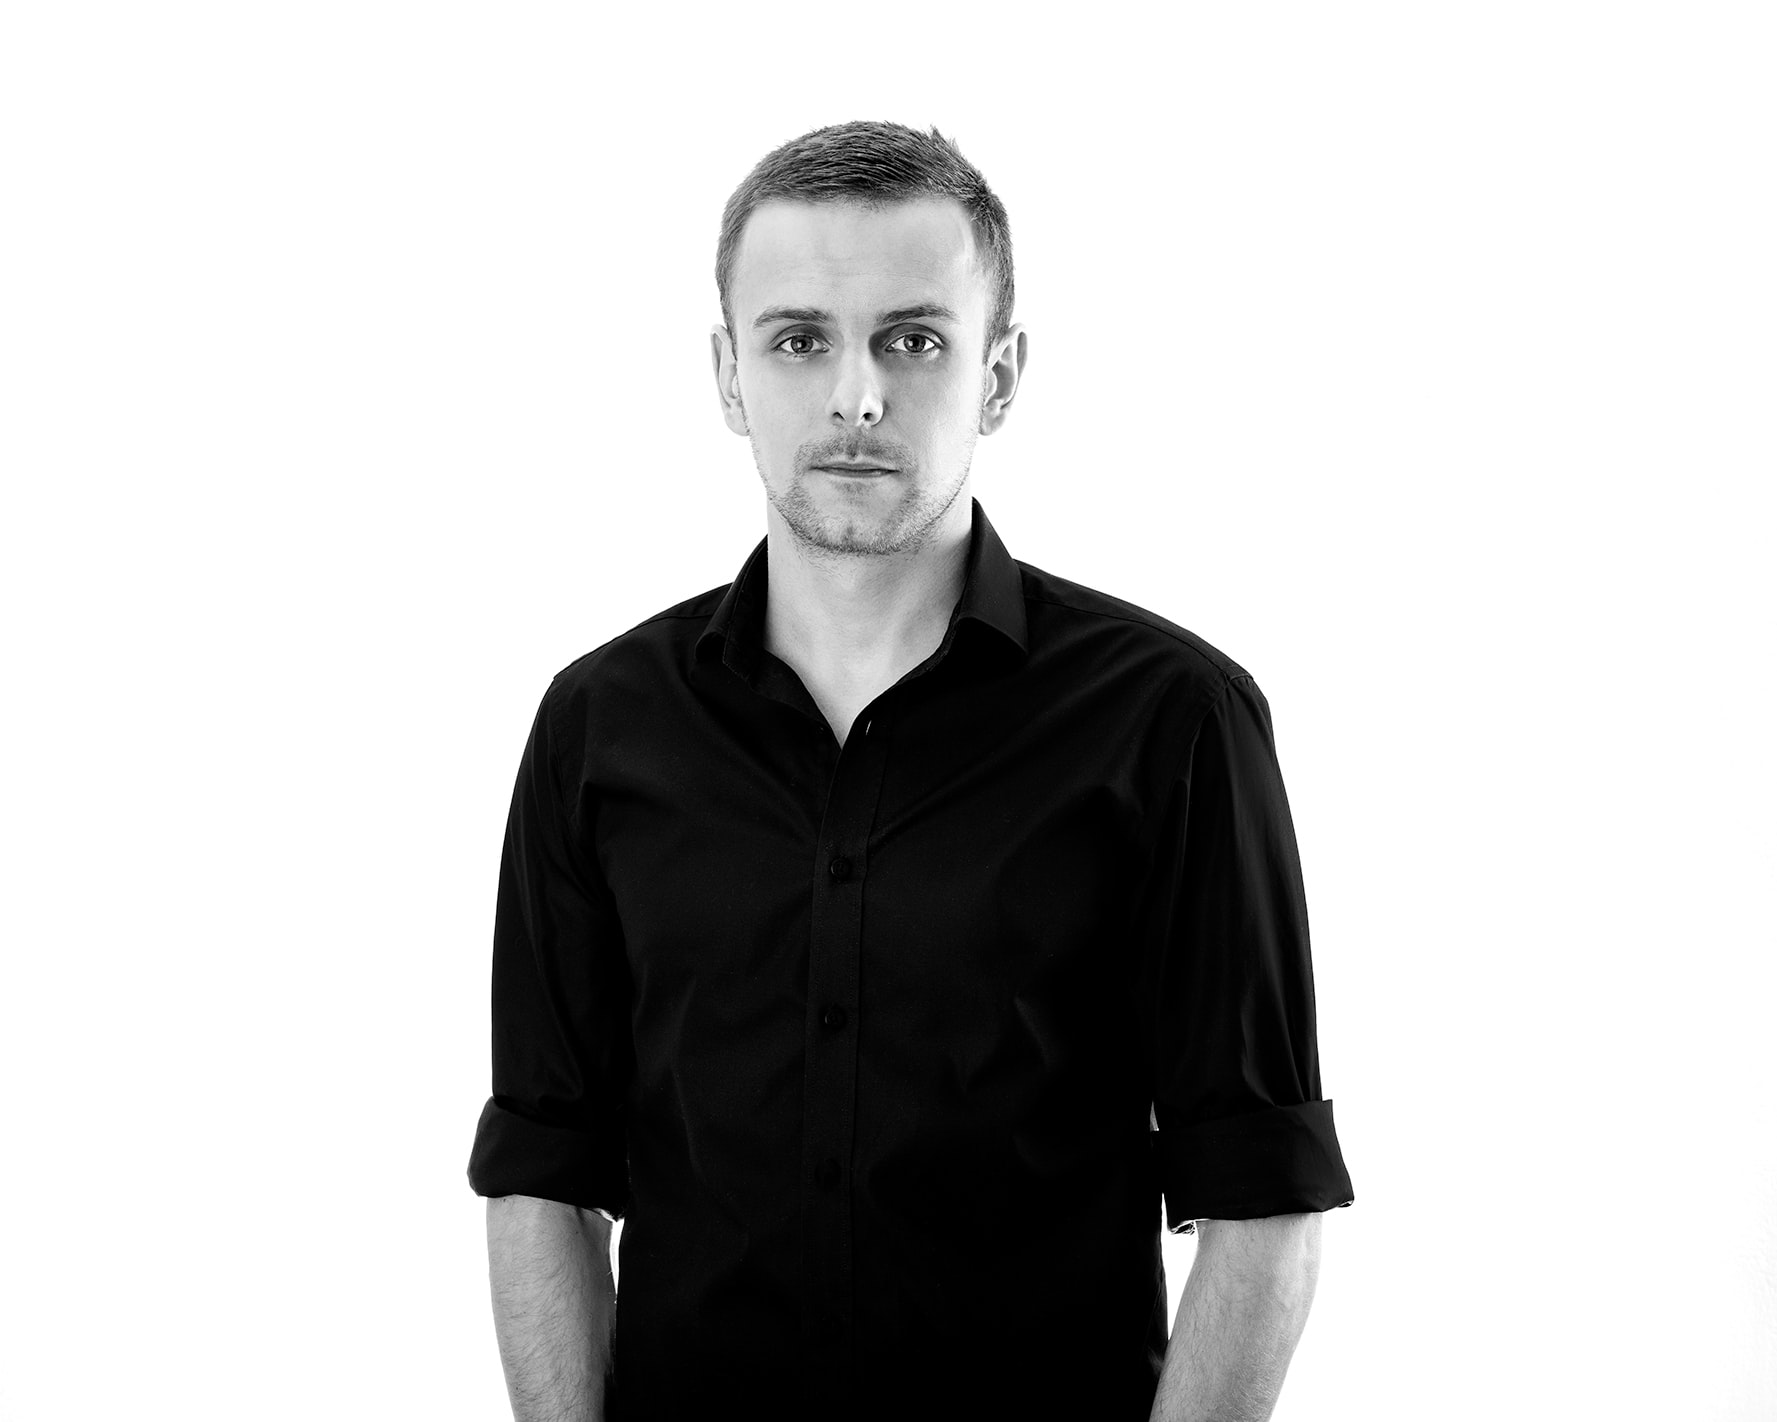 Go to Radek Grzybowski's profile